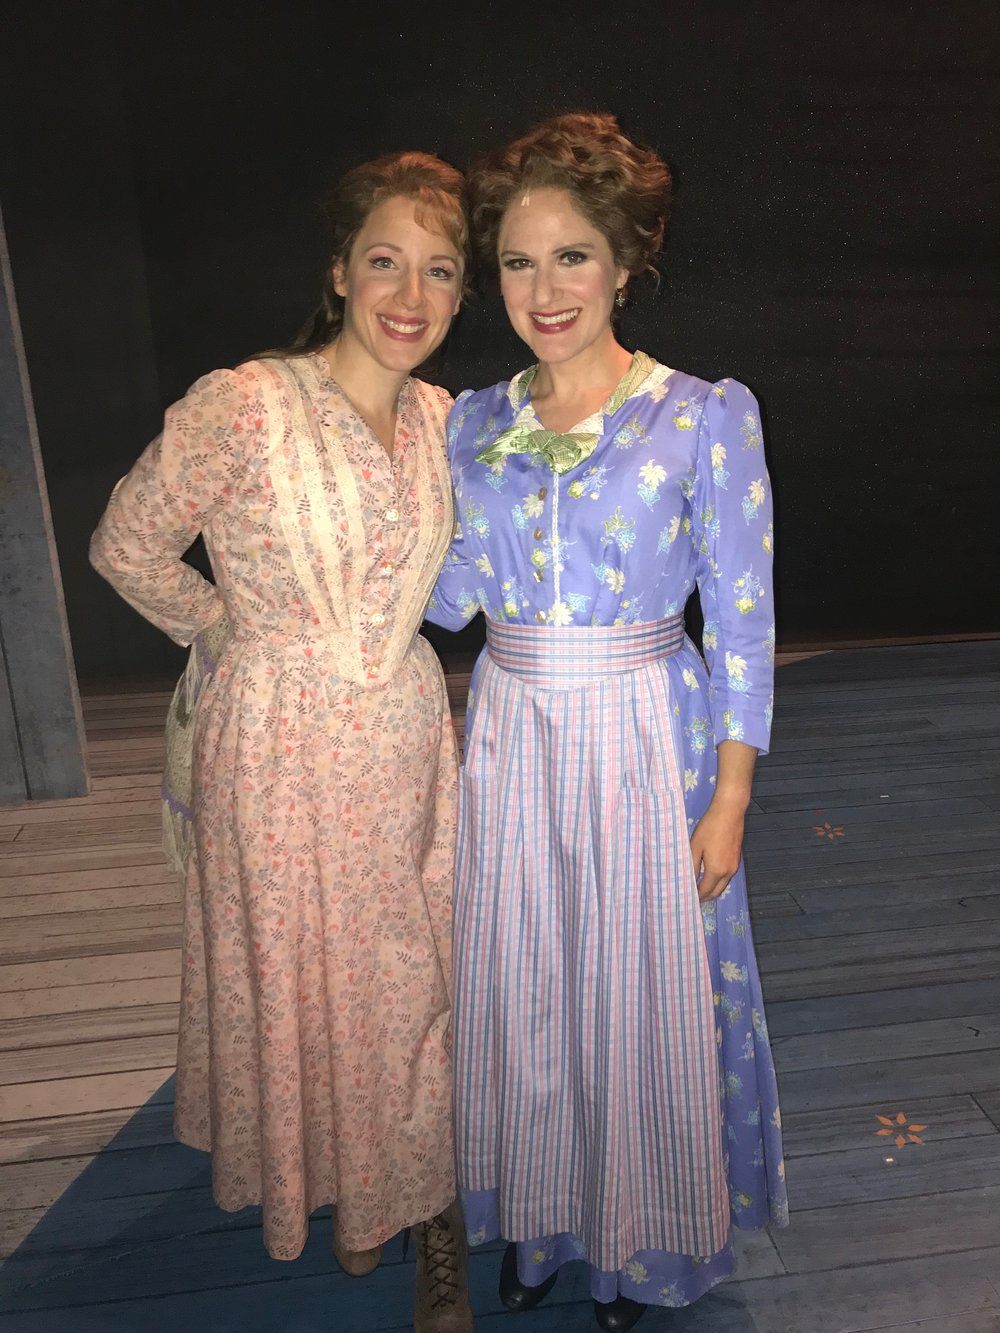 Nettie, Carousel, Broadway (with Jessie Mueller)